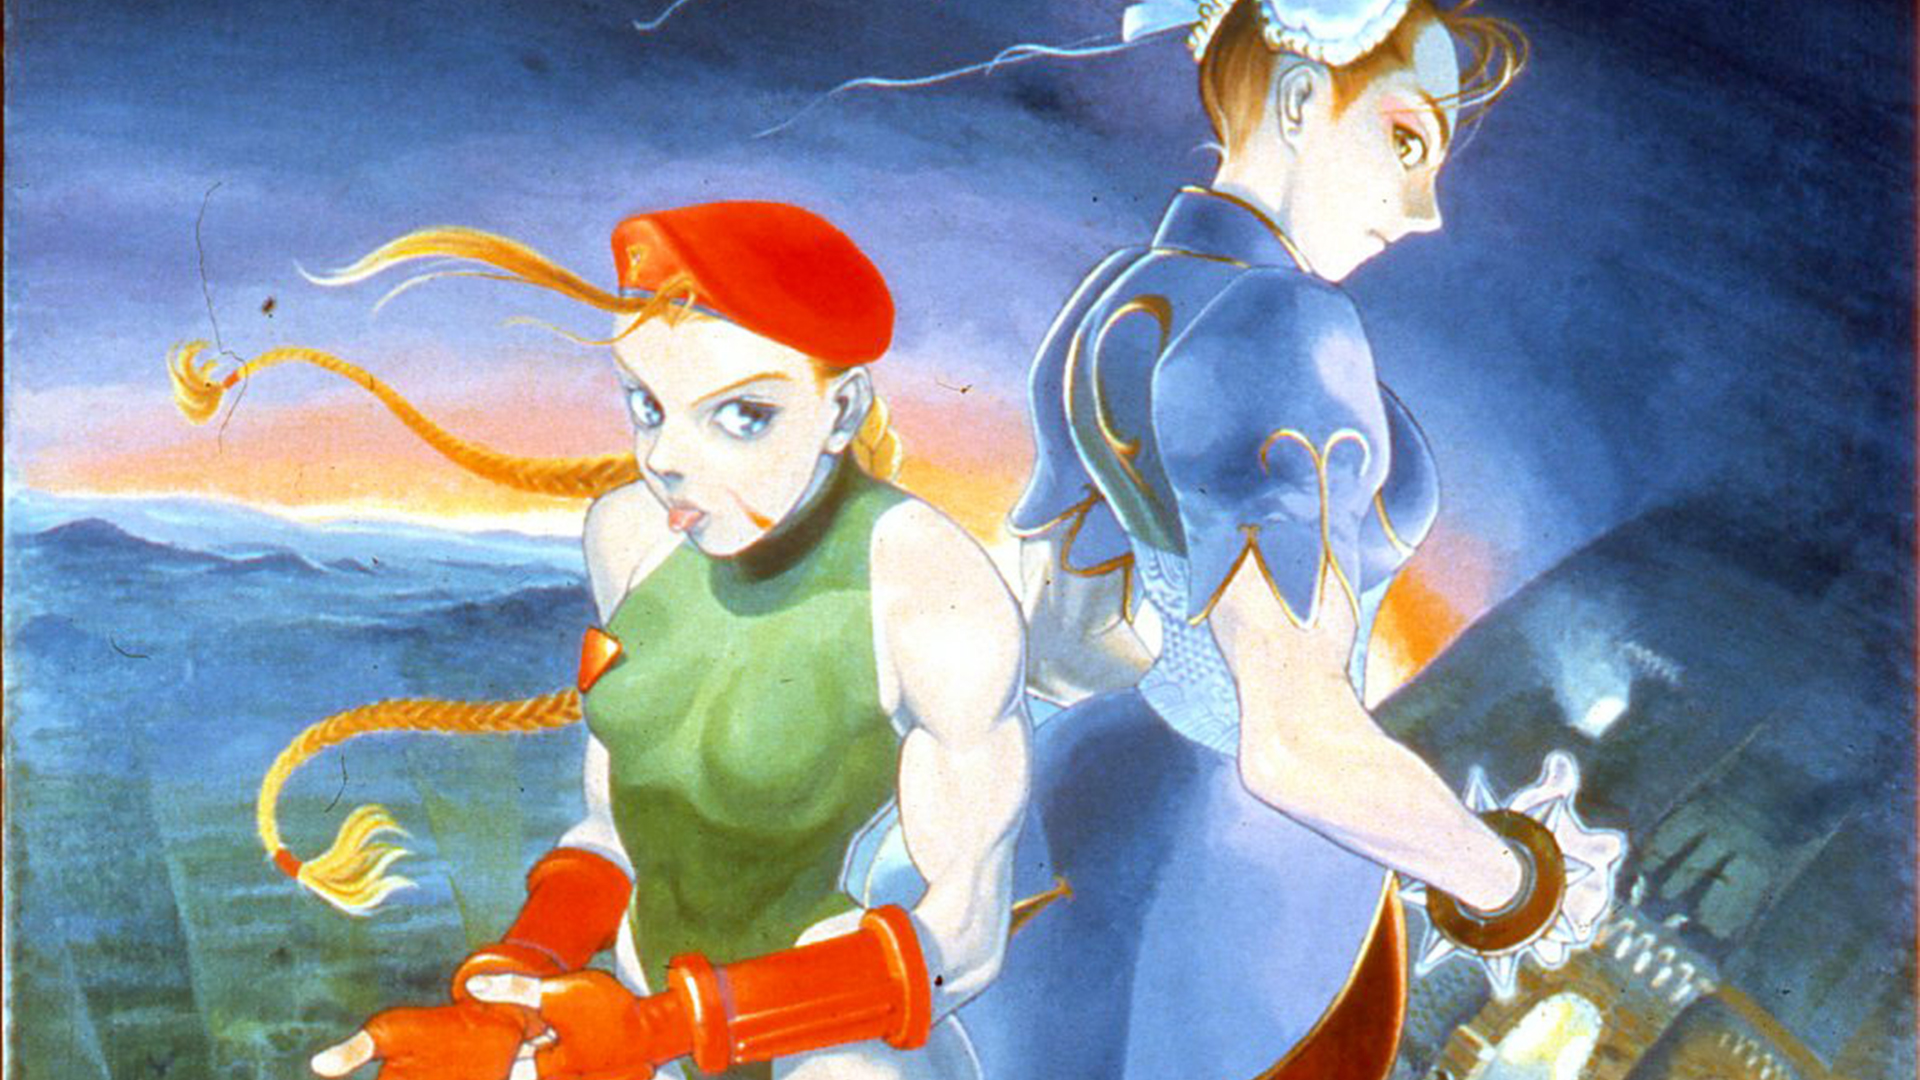 My Photo Wallpaper 3d Super Street Fighter Ii Turbo Details Launchbox Games